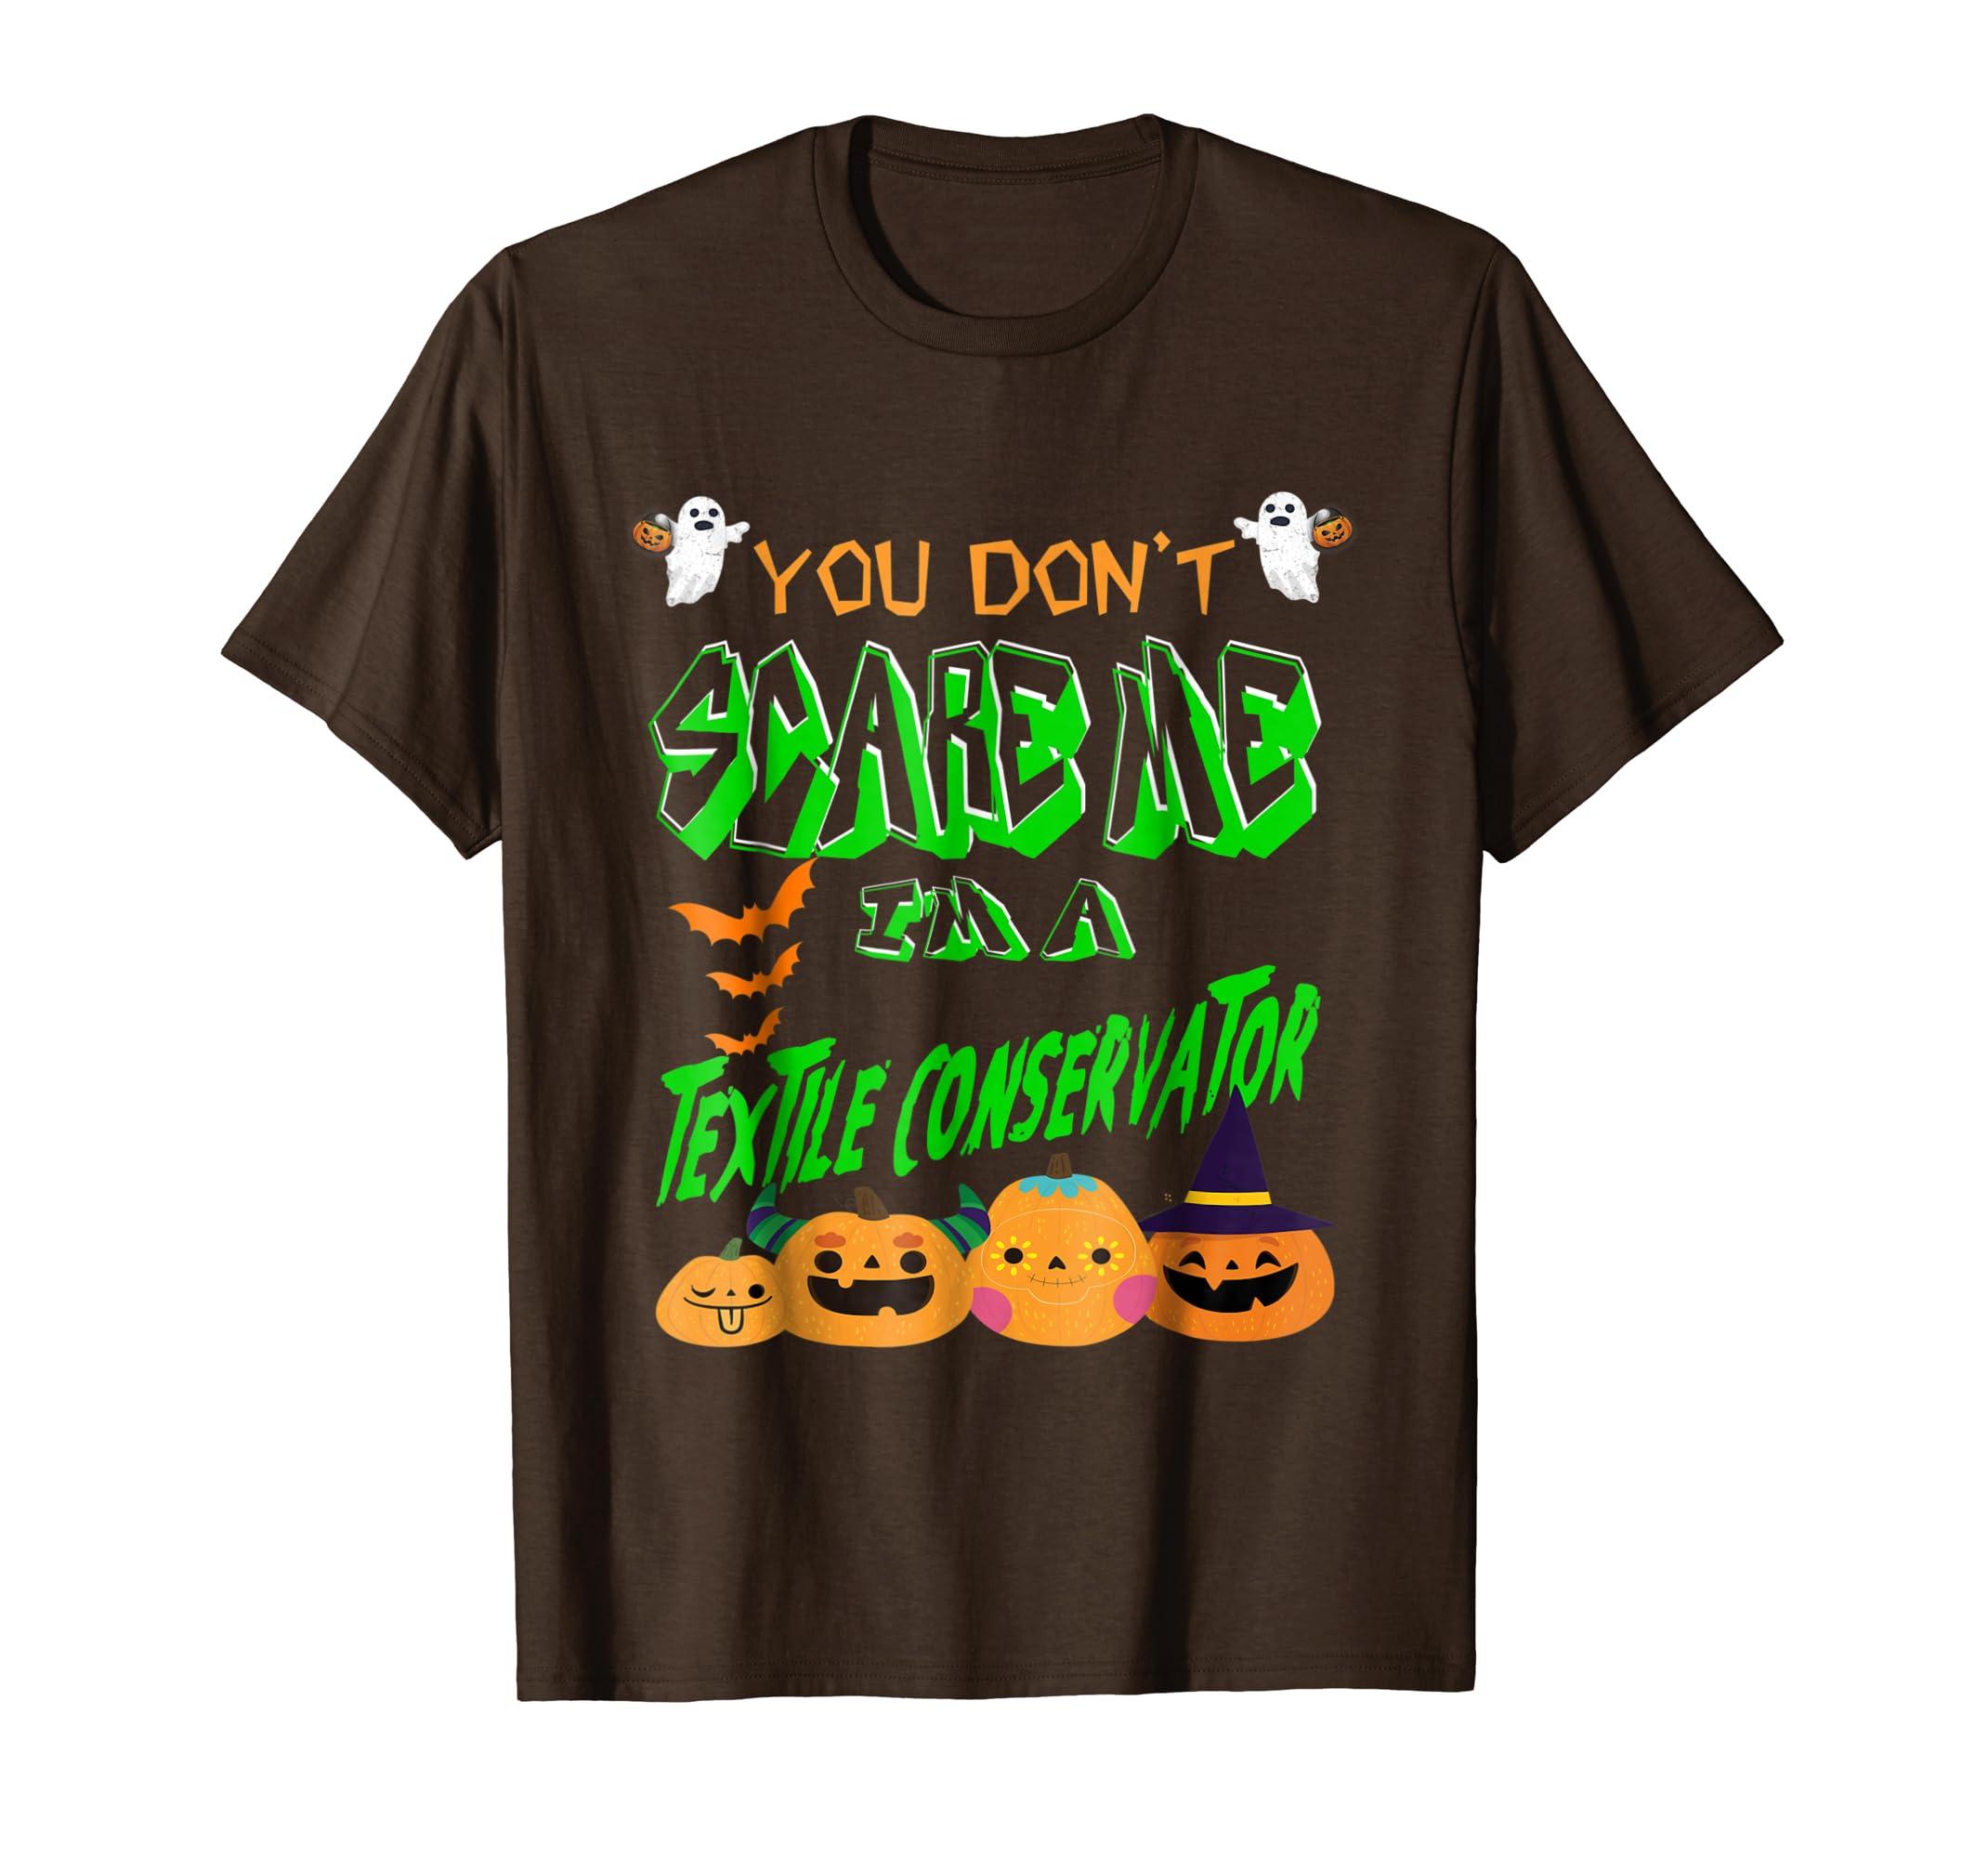 You Don't Scare Me I'm A Textile Conservator T shirt-ln